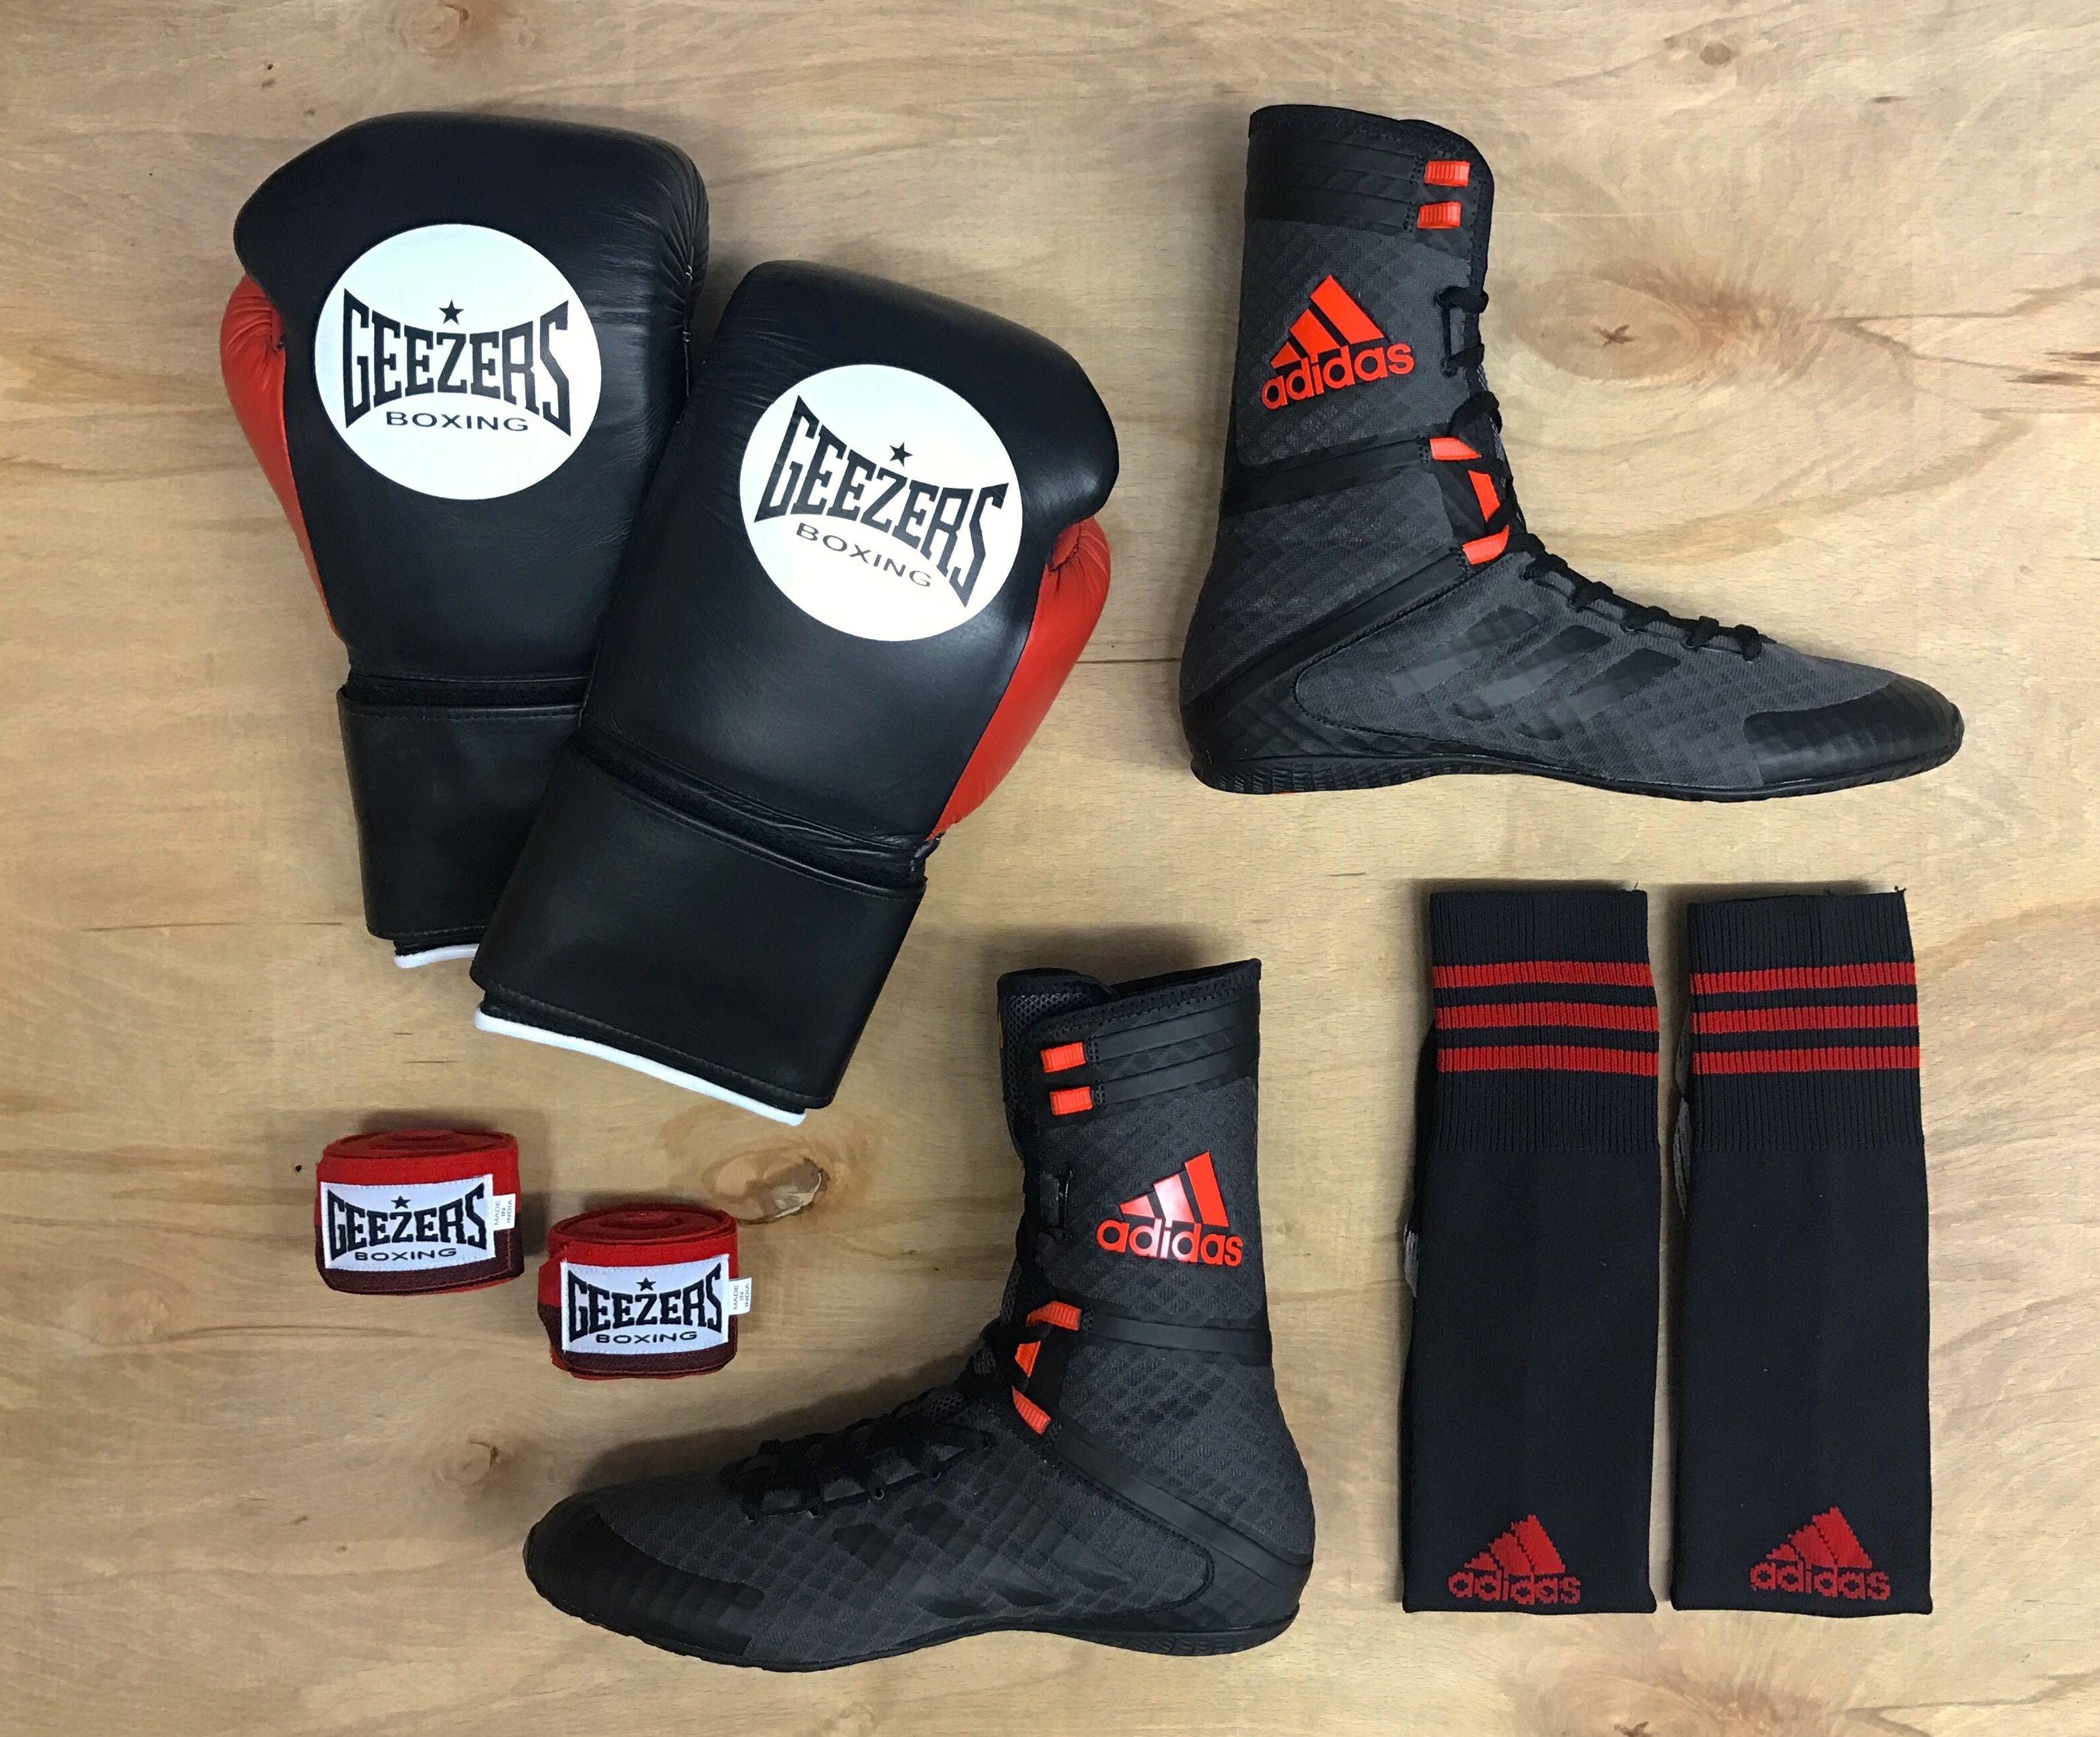 Adidas Speedex 16 1 Hc Boots With The Geezers Elite Pro